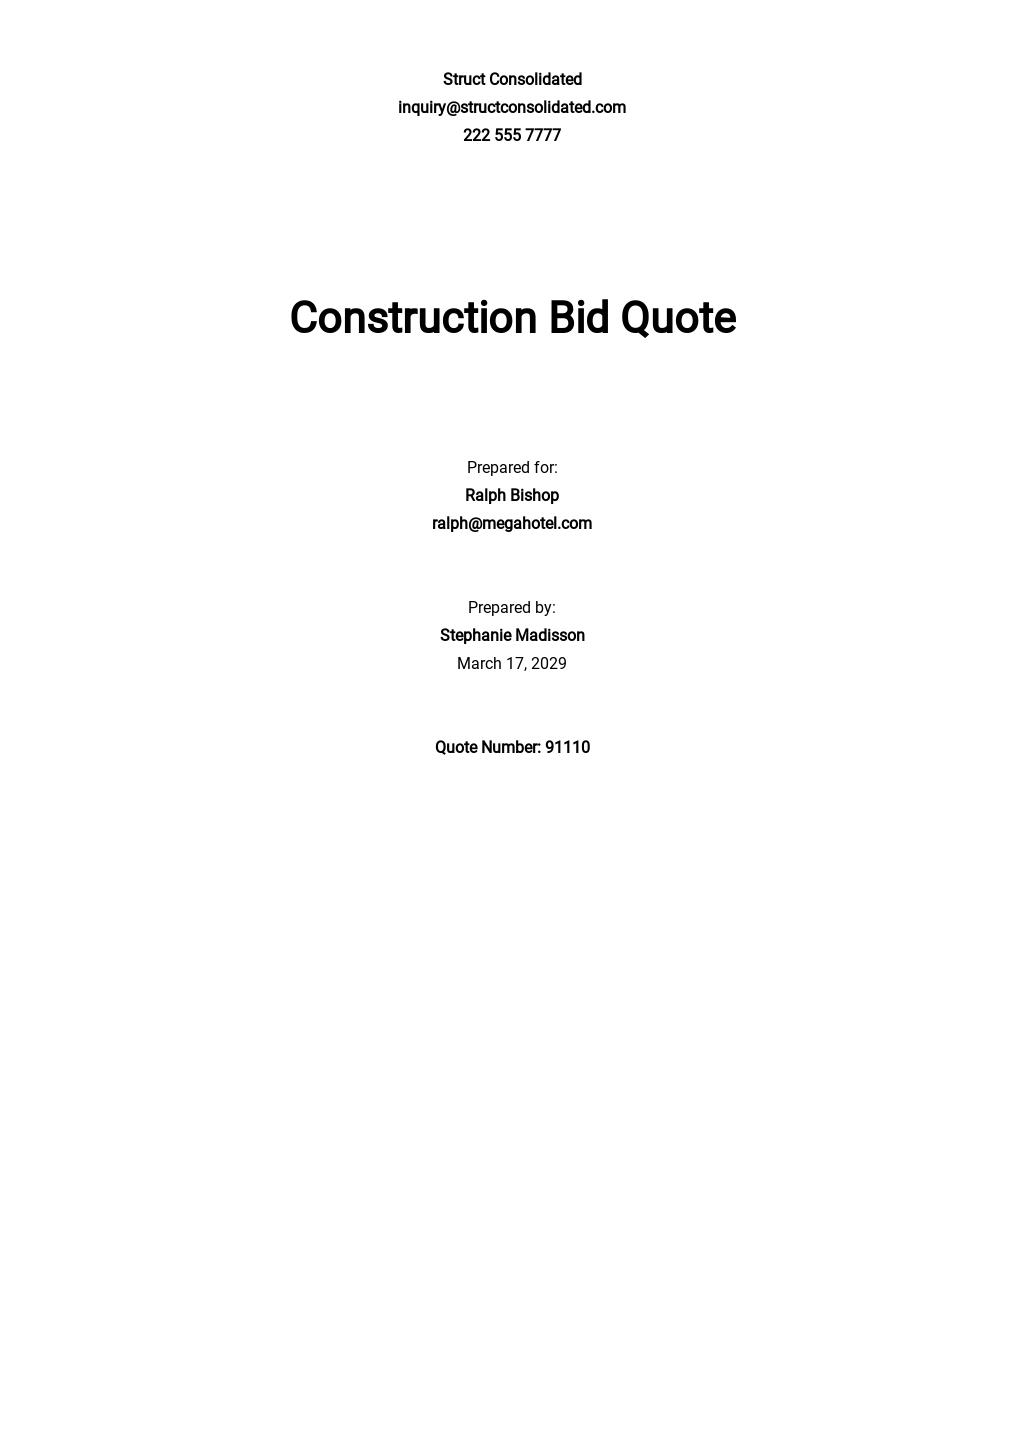 Construction Bid Quotation Template